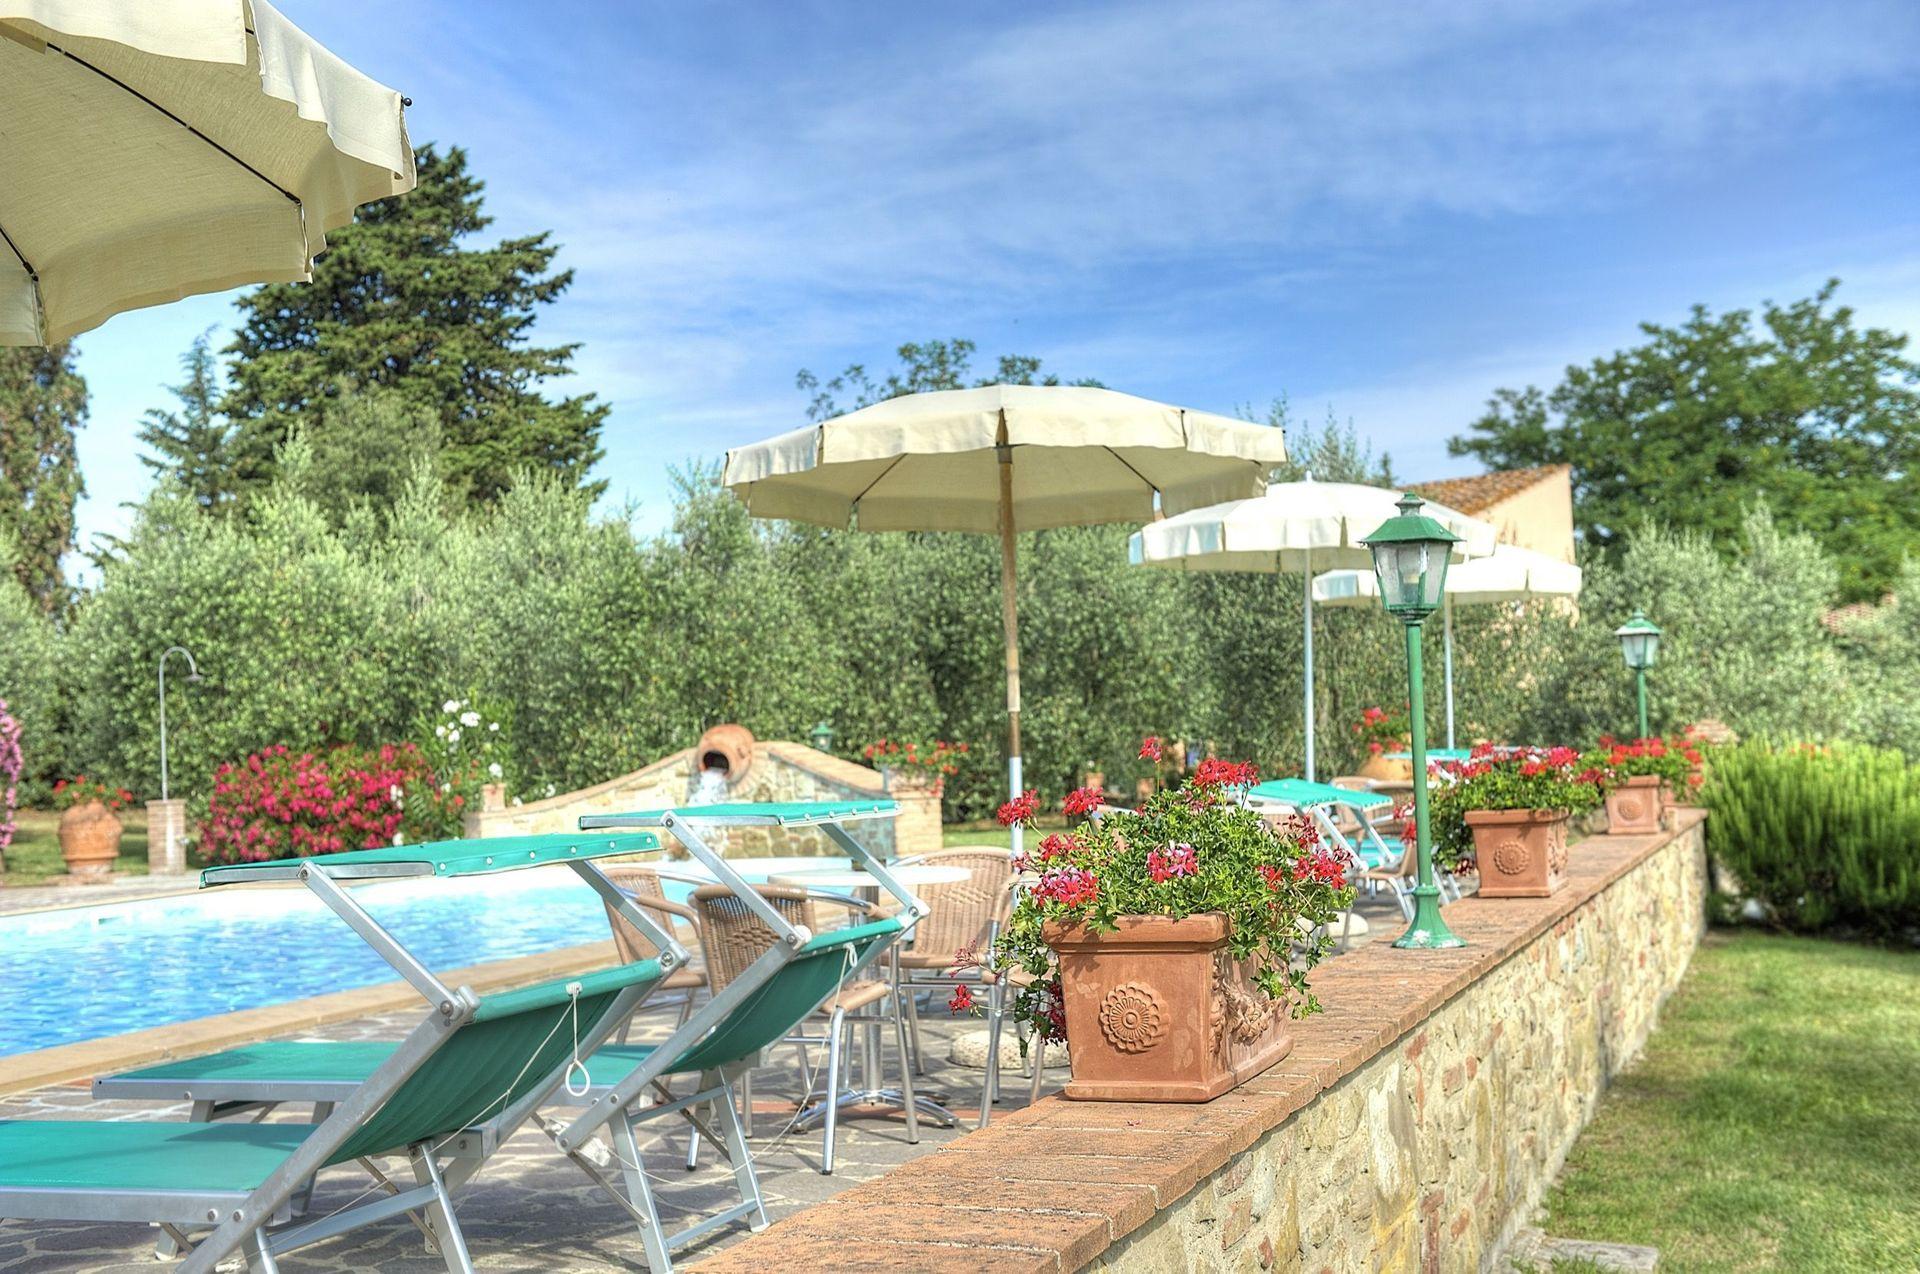 Montelopio location de vacances couchages 42 dans 14 for Piscine 42 exam